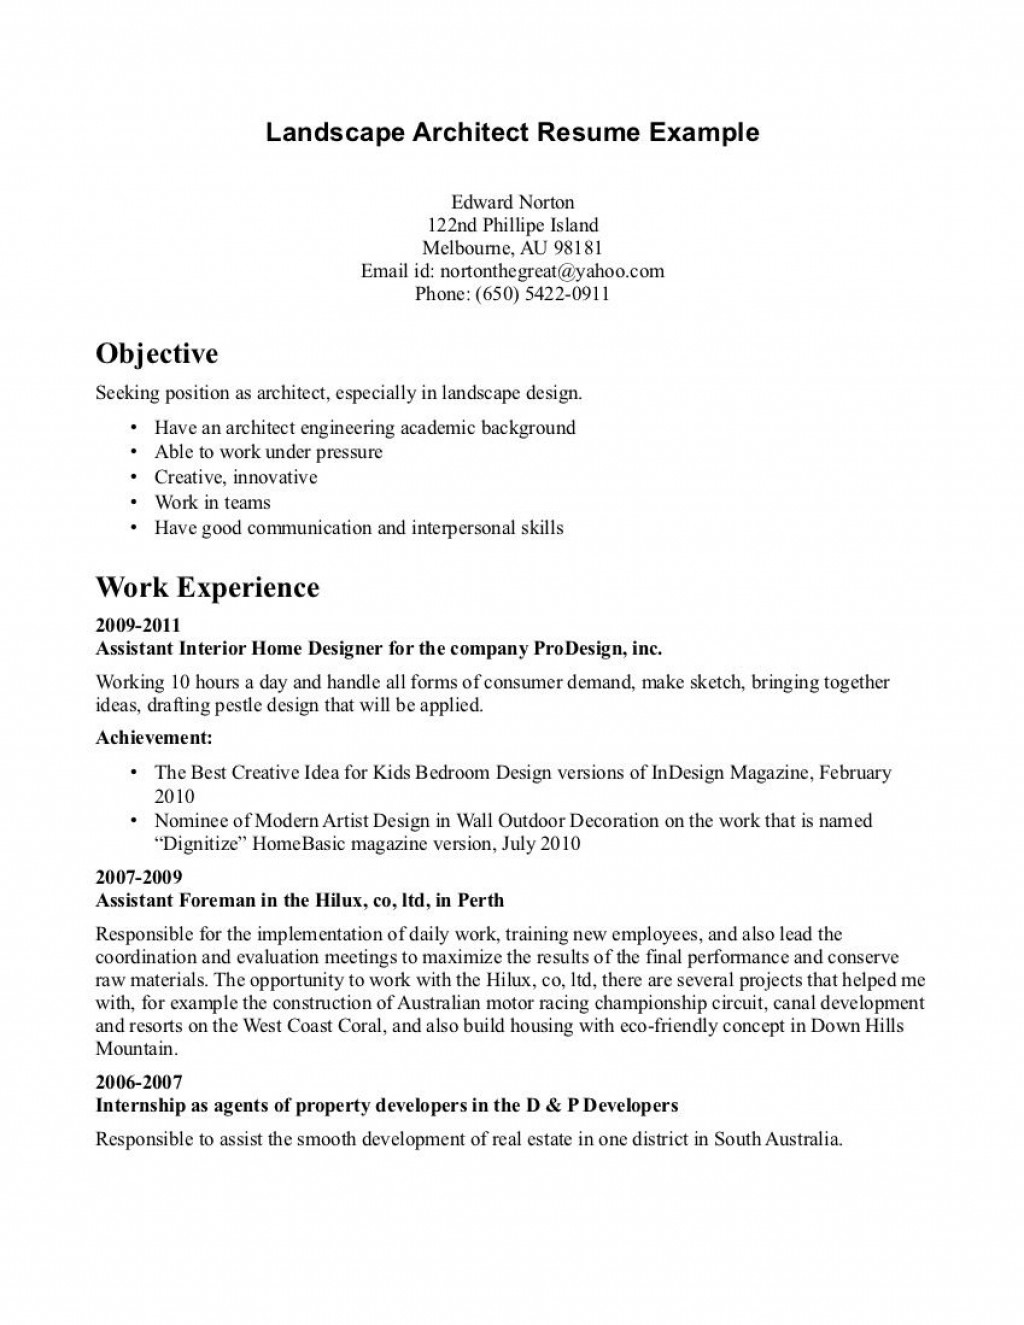 008 Essay Example Landscape Stunning Architecture Argumentative Topics Large